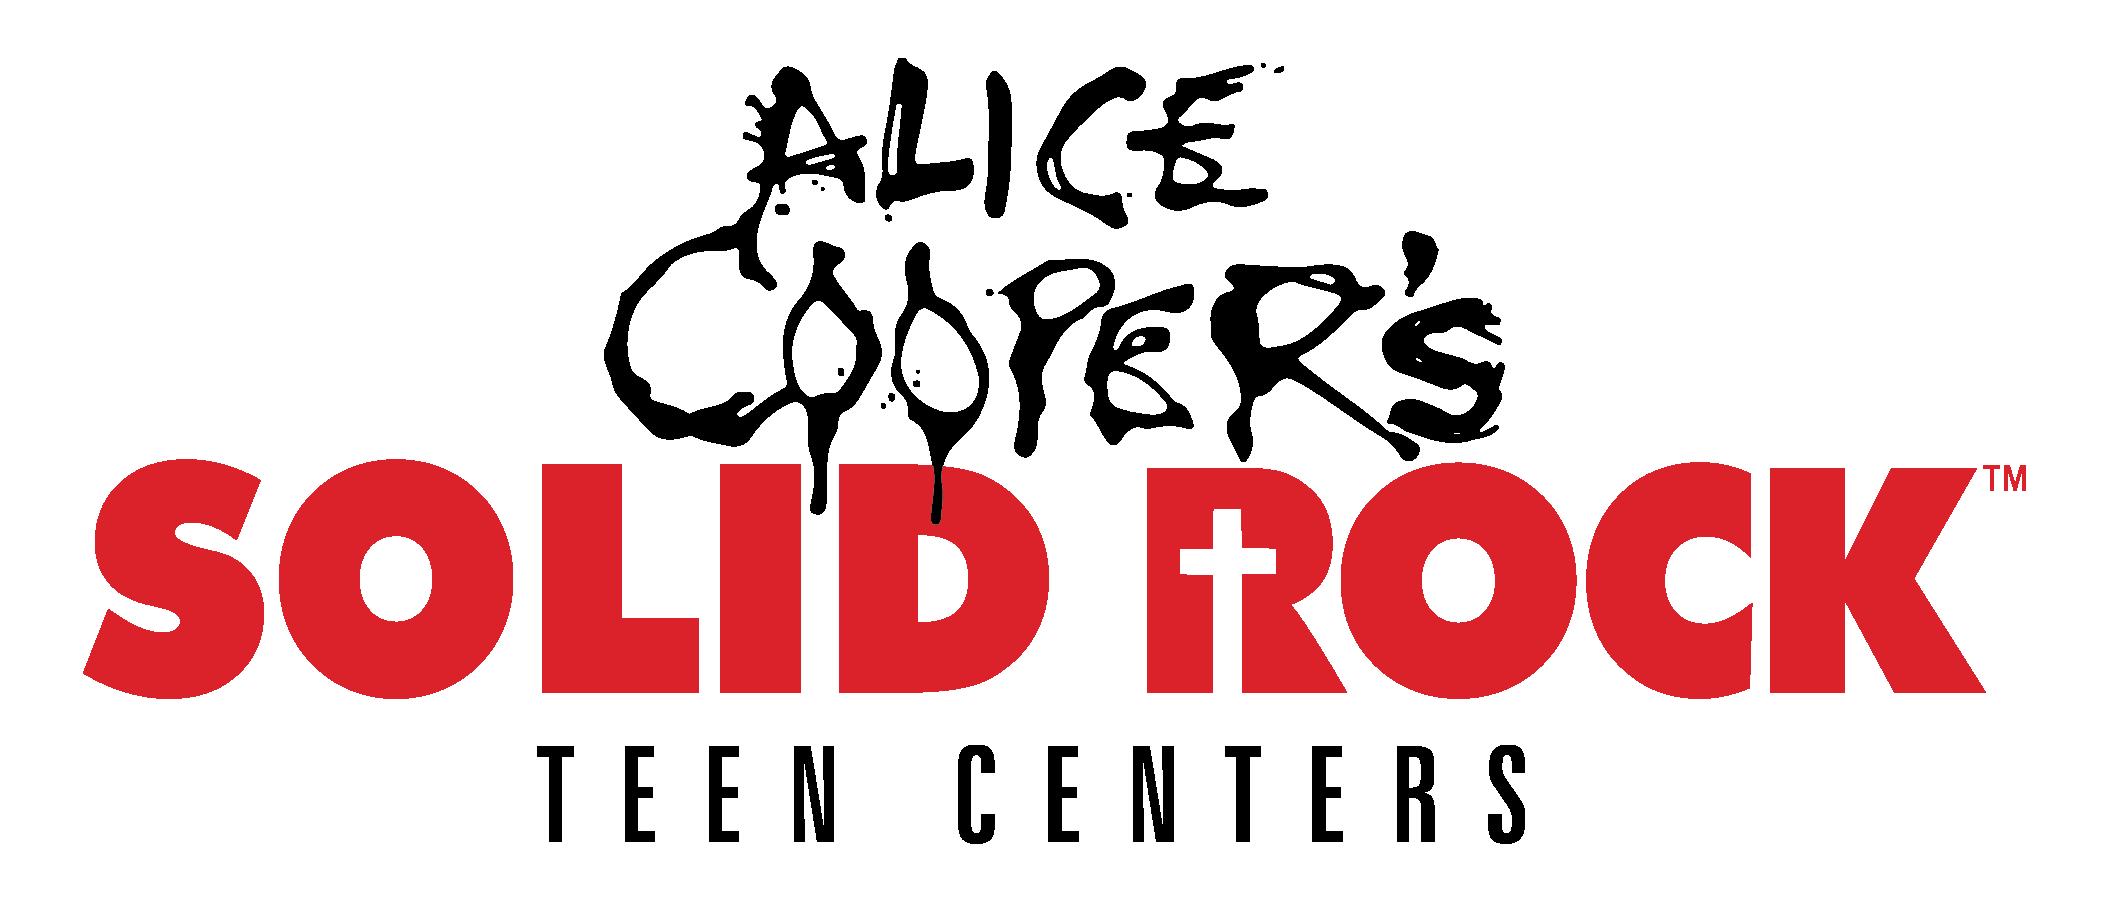 Alice Coopers Solid Rock Teen Center - Cross - PNG.png